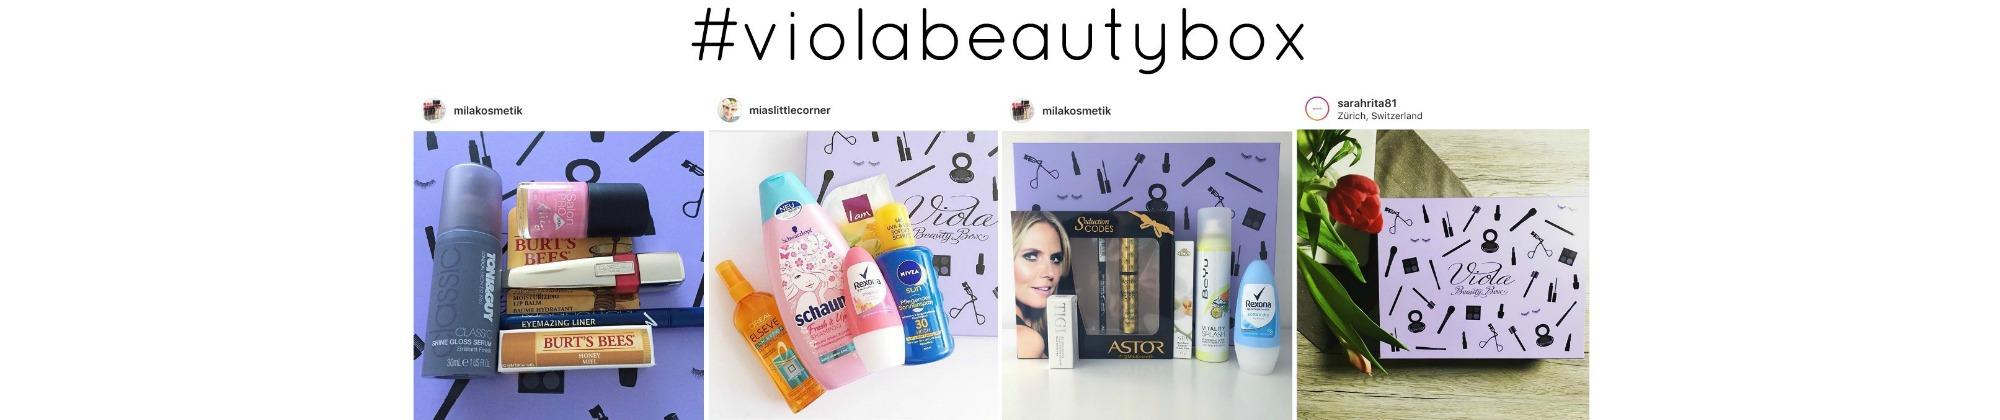 #violabeautybox